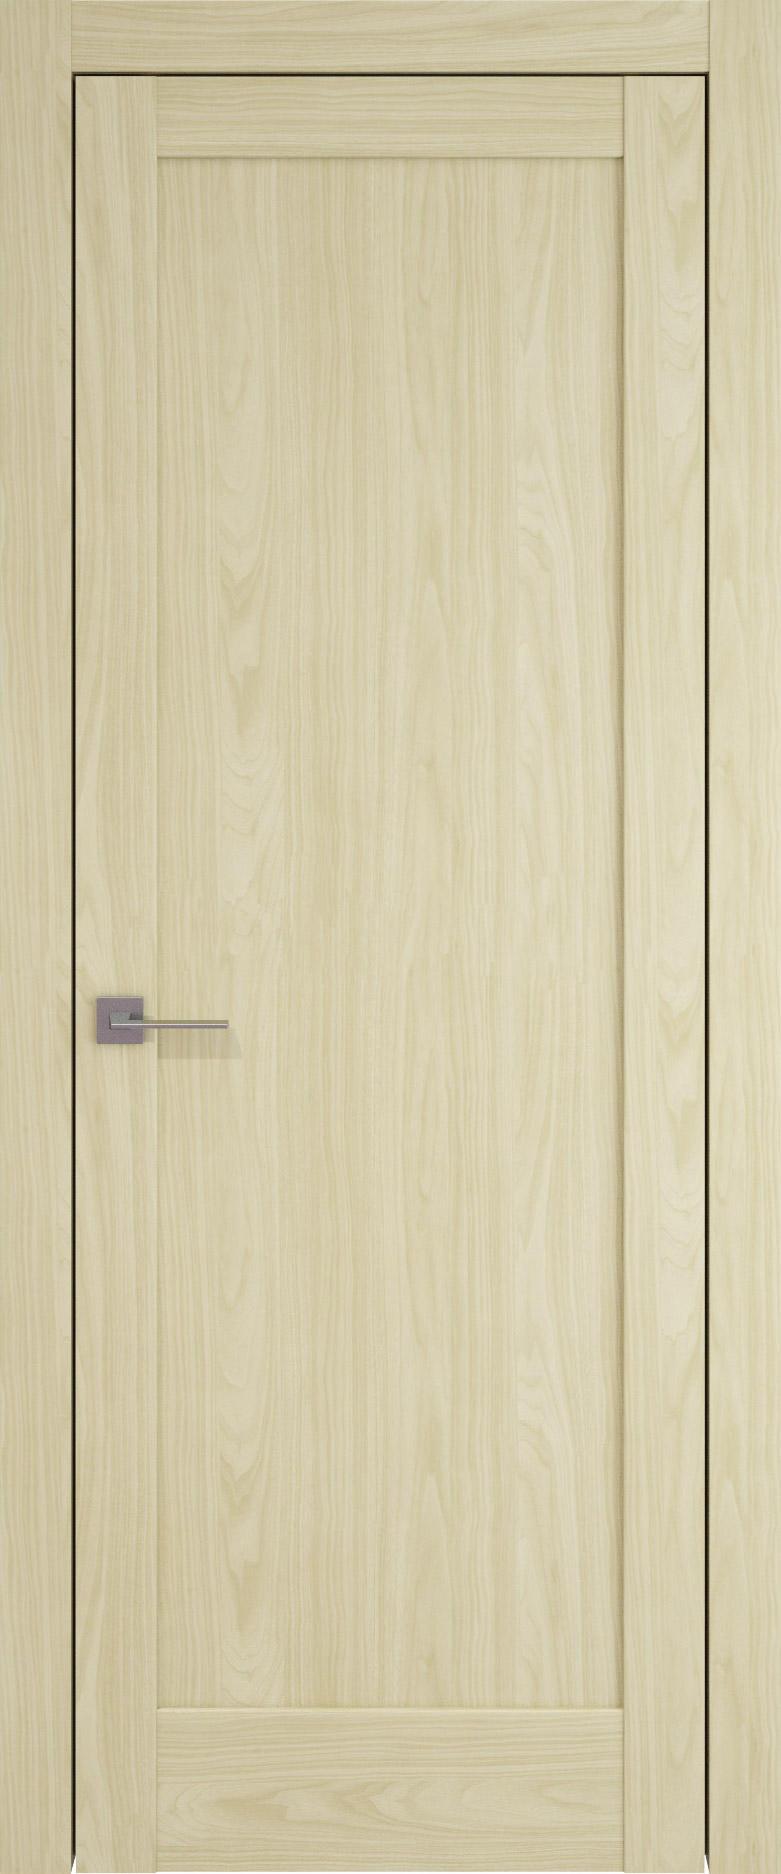 Strada цвет - Дуб нордик Без стекла (ДГ)